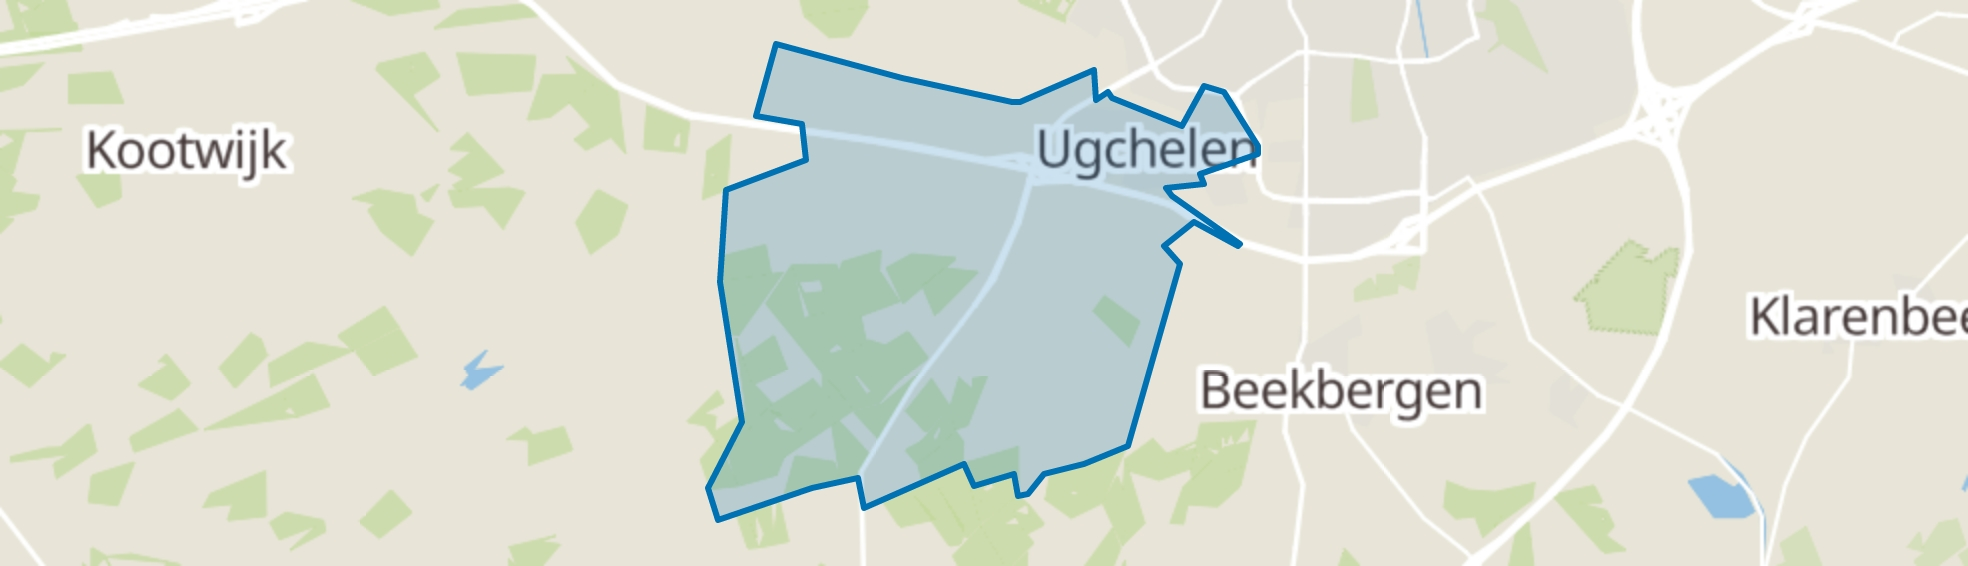 Ugchelen map